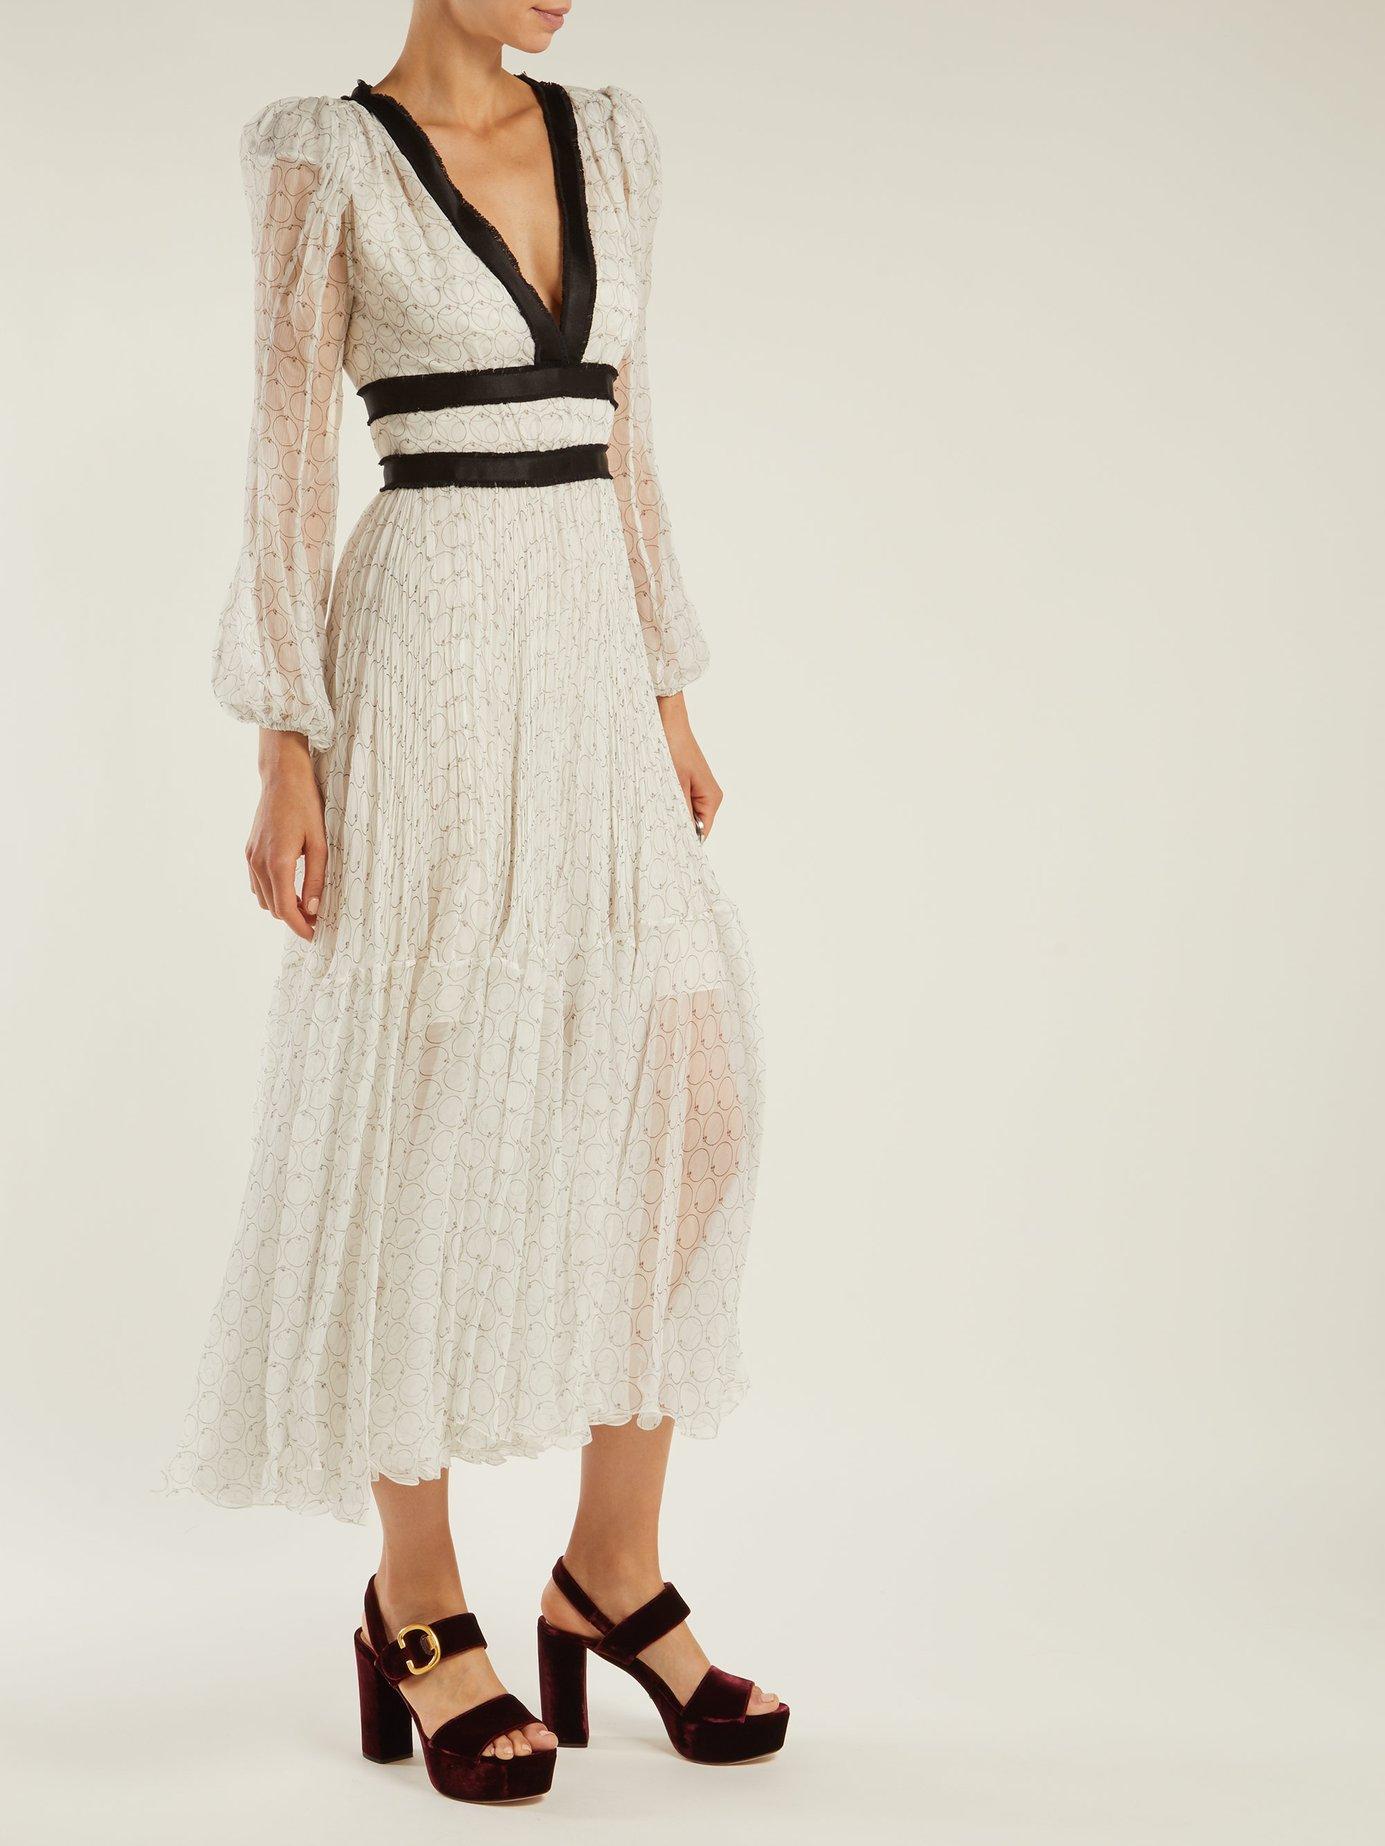 Opal geometric-print silk midi dress by Maria Lucia Hohan